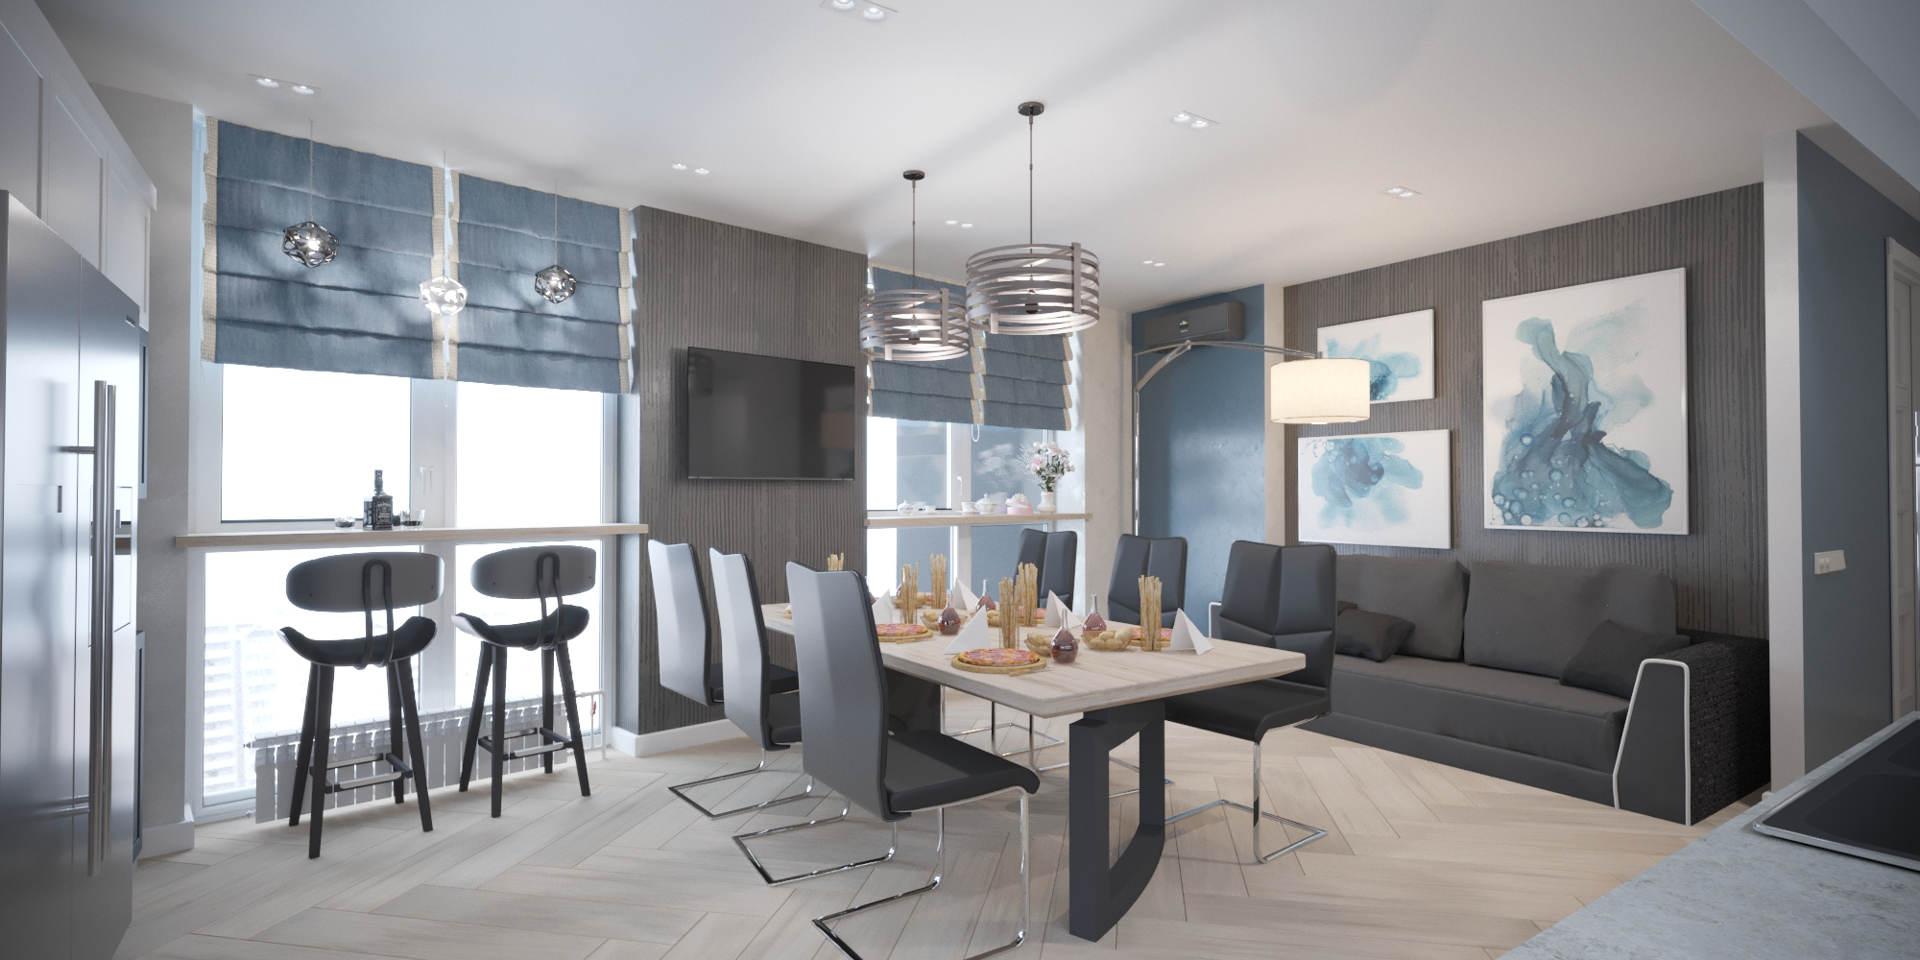 Дизайн интерьера кухни в стиле лофт фото